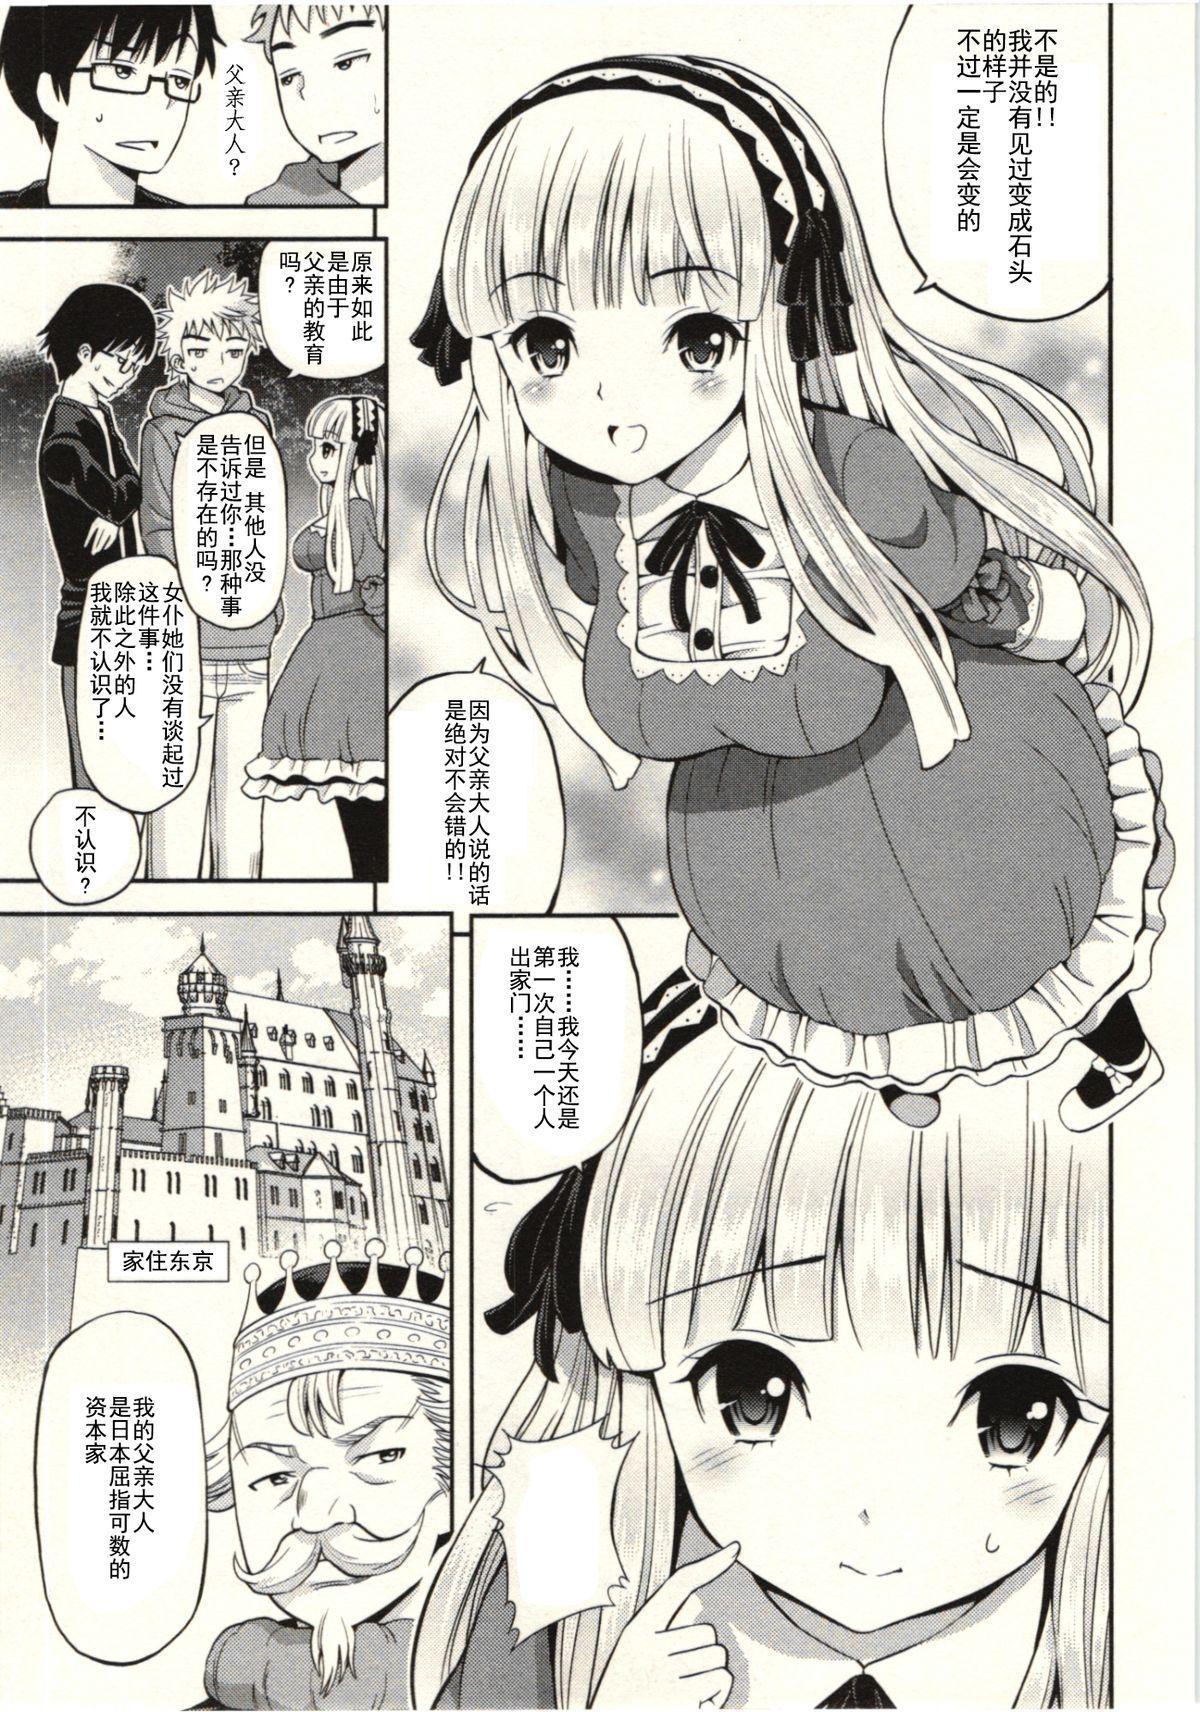 Tadashii Majutsu no Asobikata - The right way of playing of magic. 127